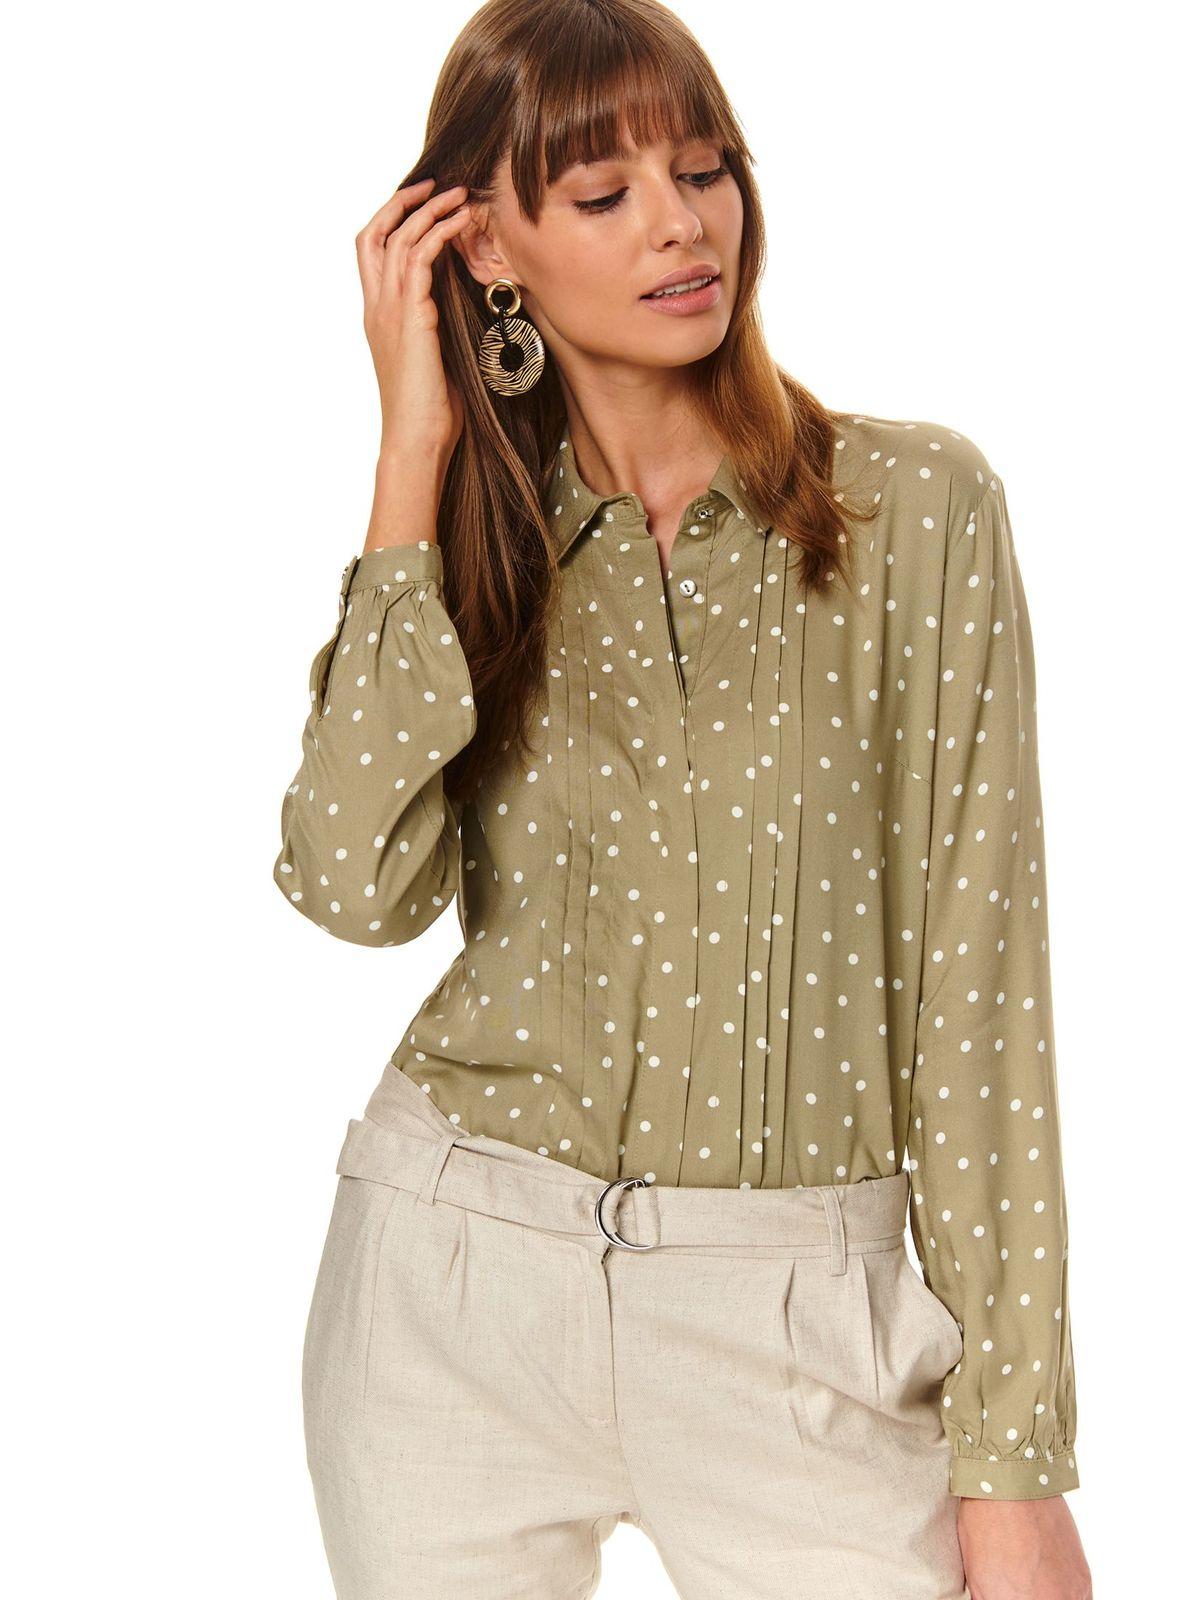 Zöld pöttyös galléros női ing